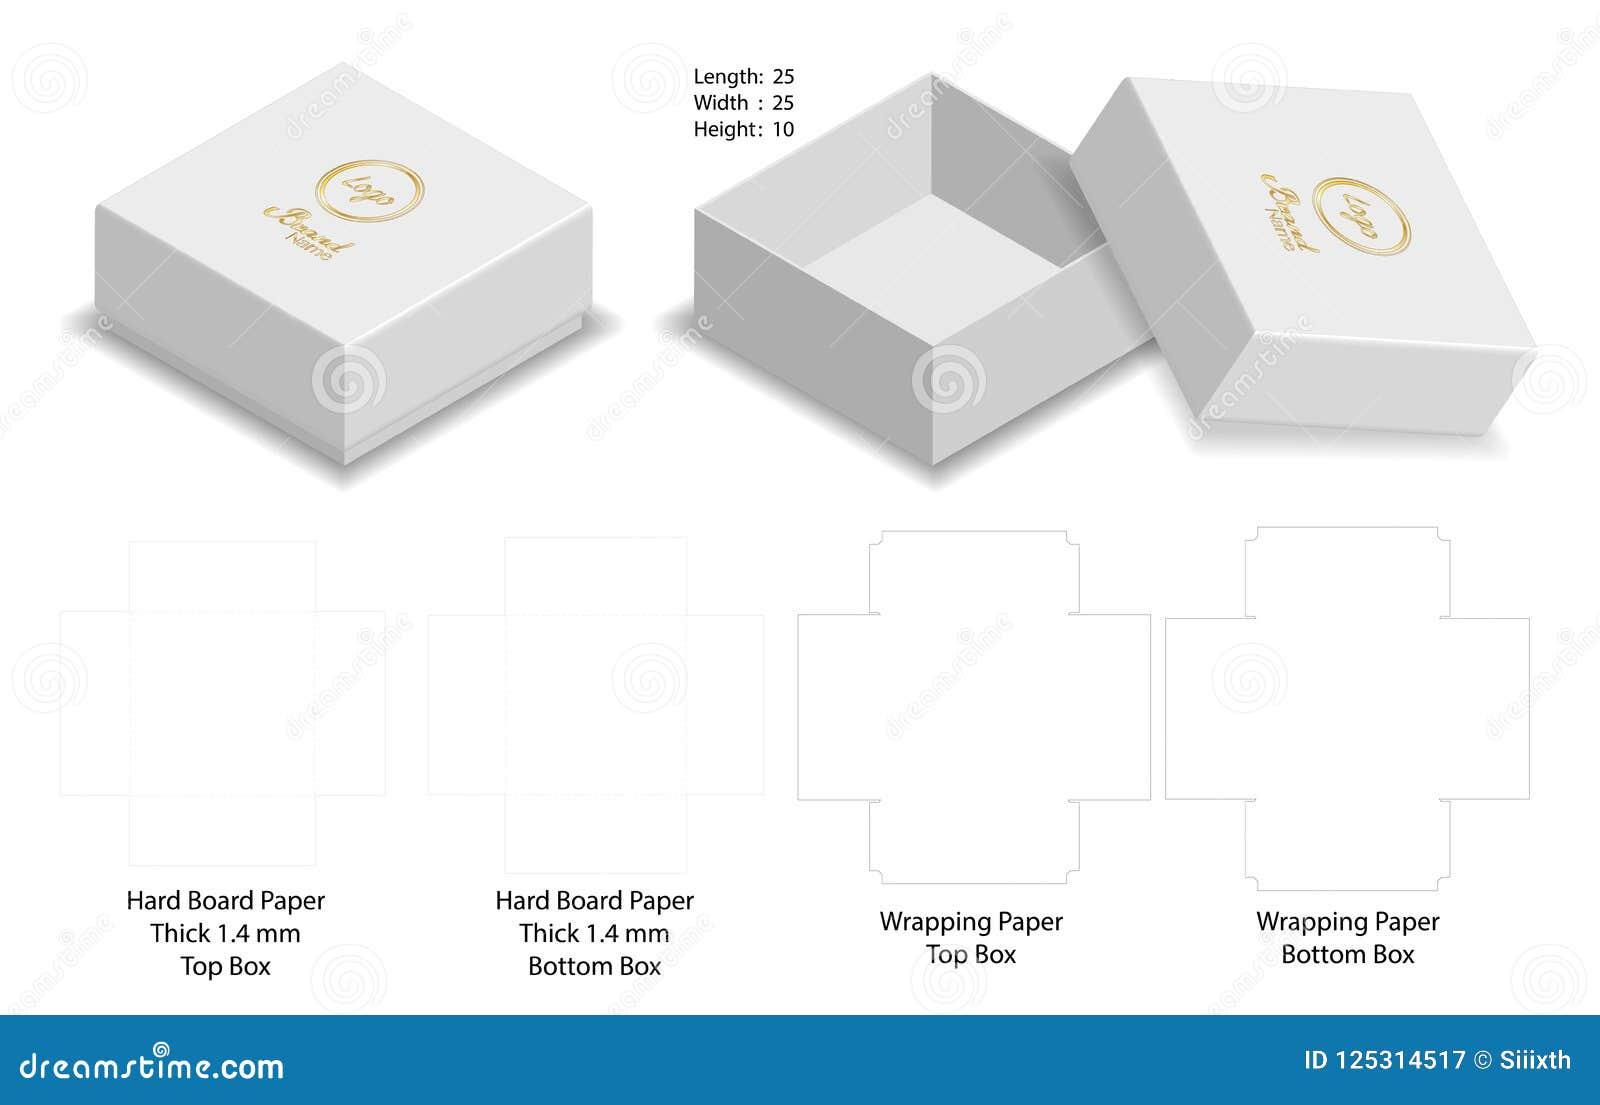 A Box Packaging Die Cut Template Design 3d Mock Up